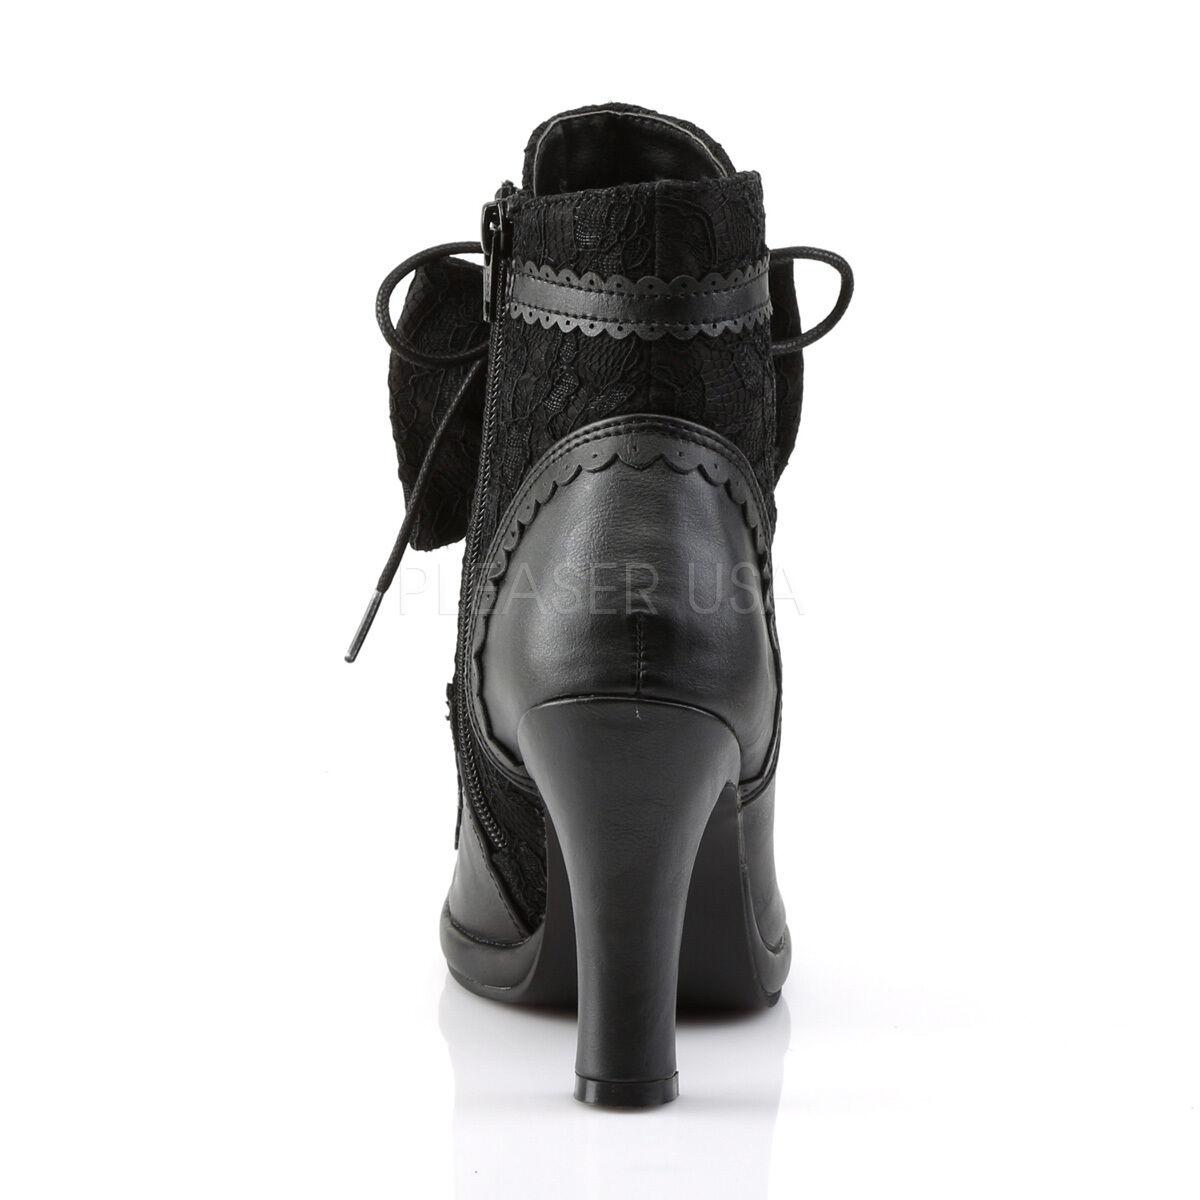 DEMONIA Gothic Punk Lolita Platform Ankle High Stiefel w/ Puffy Heart & Lace Bow